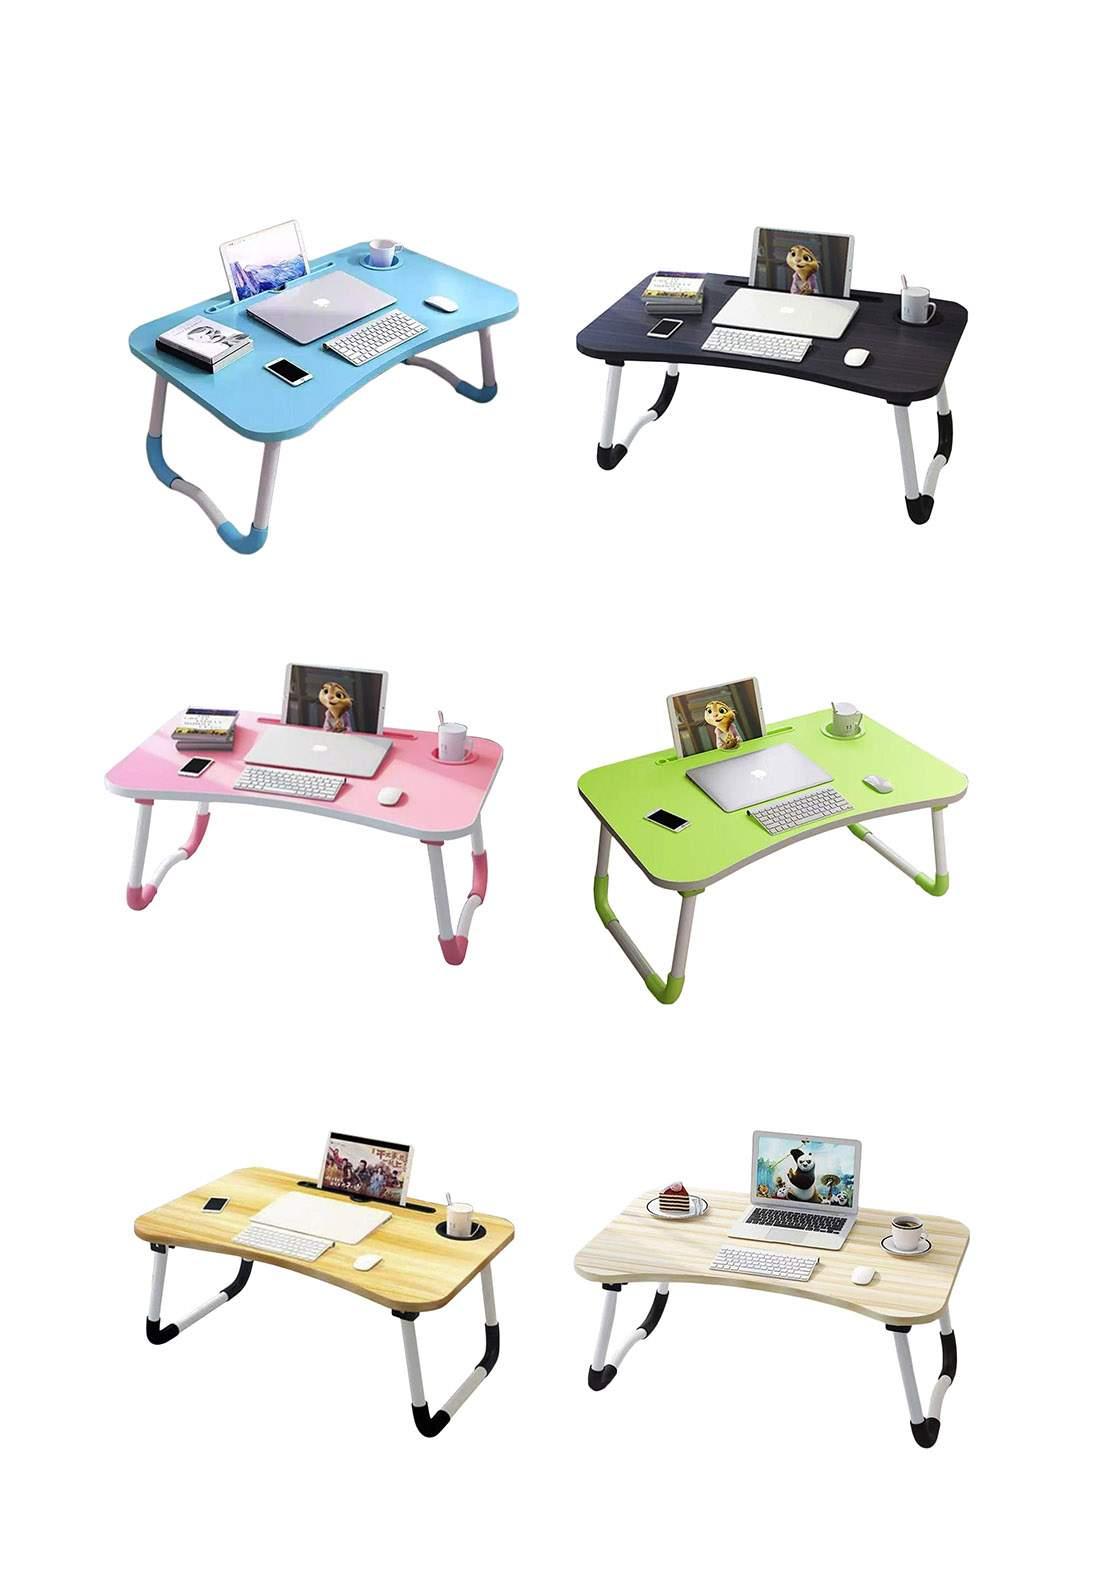 Portable Folding Desk Laptop Tablet Cup Holder Multipurpose Learning Table منضدة لابتوب